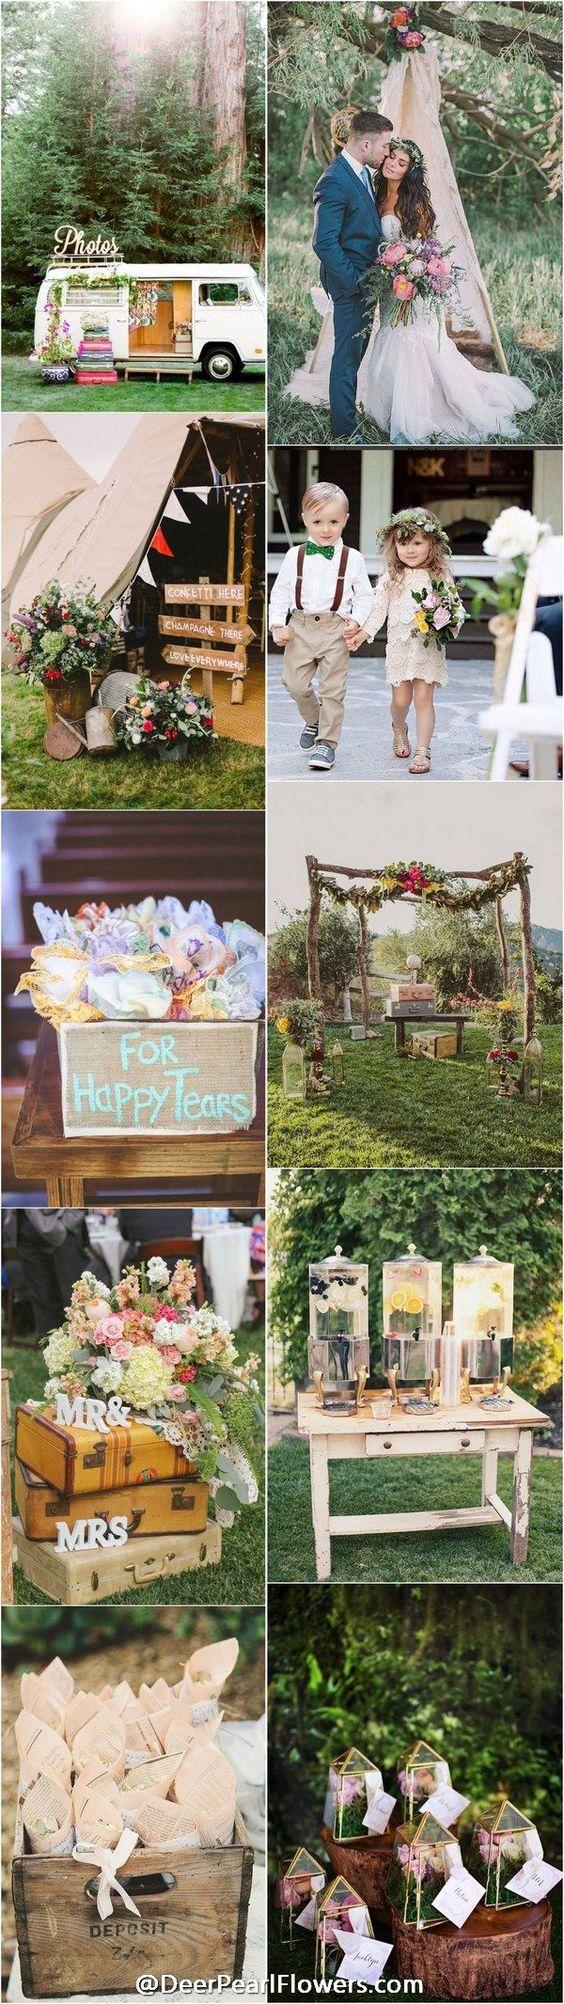 Vintage bohemian wedding theme ideas / http://www.deerpearlflowers.com/vintage-bohemian-wedding-ideas/